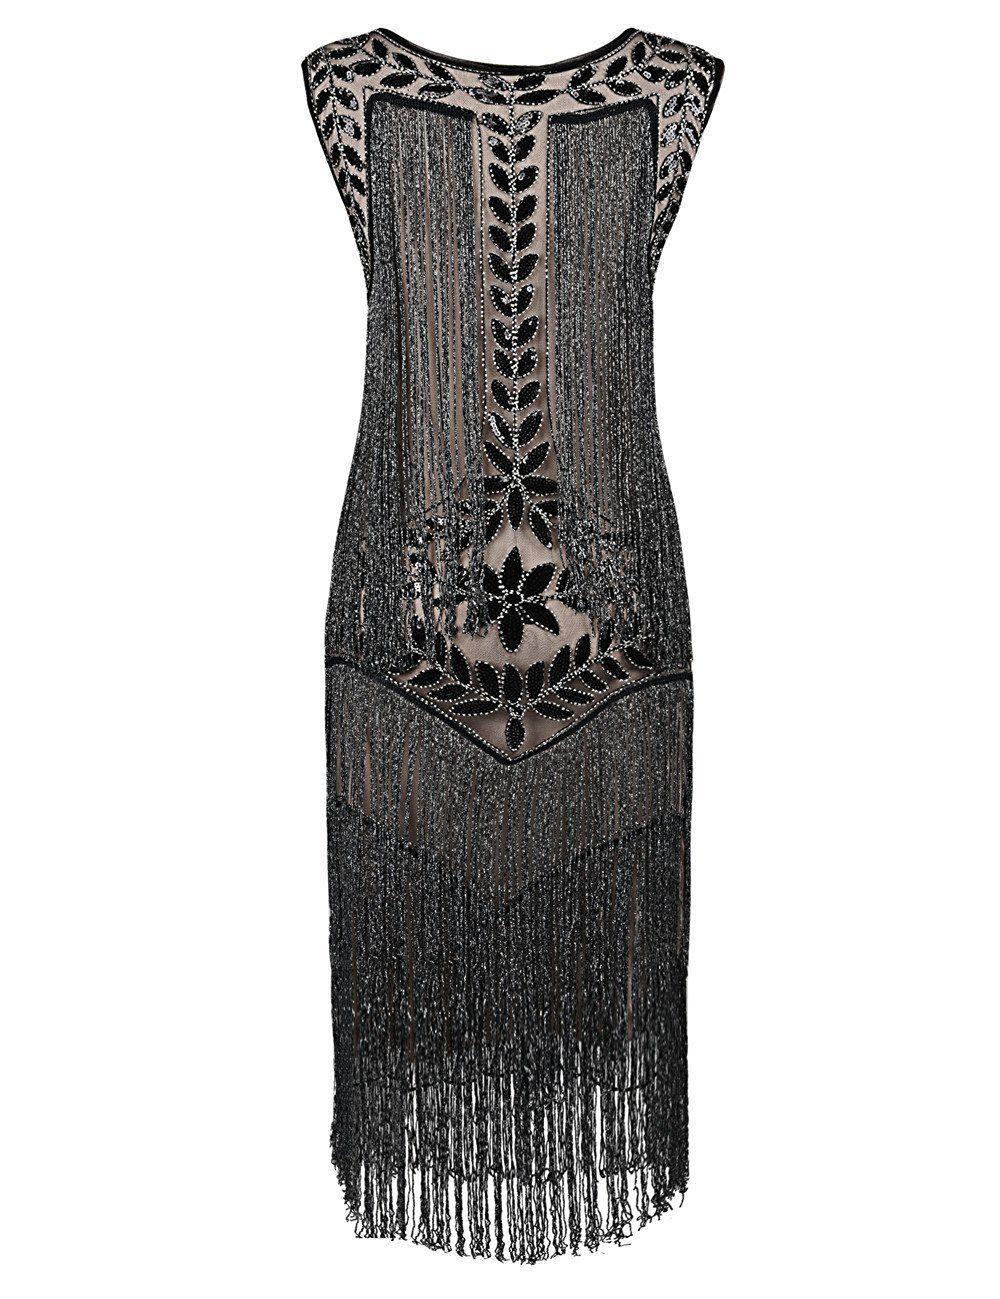 Womenus s vintage cocktail dress formal dress formal s